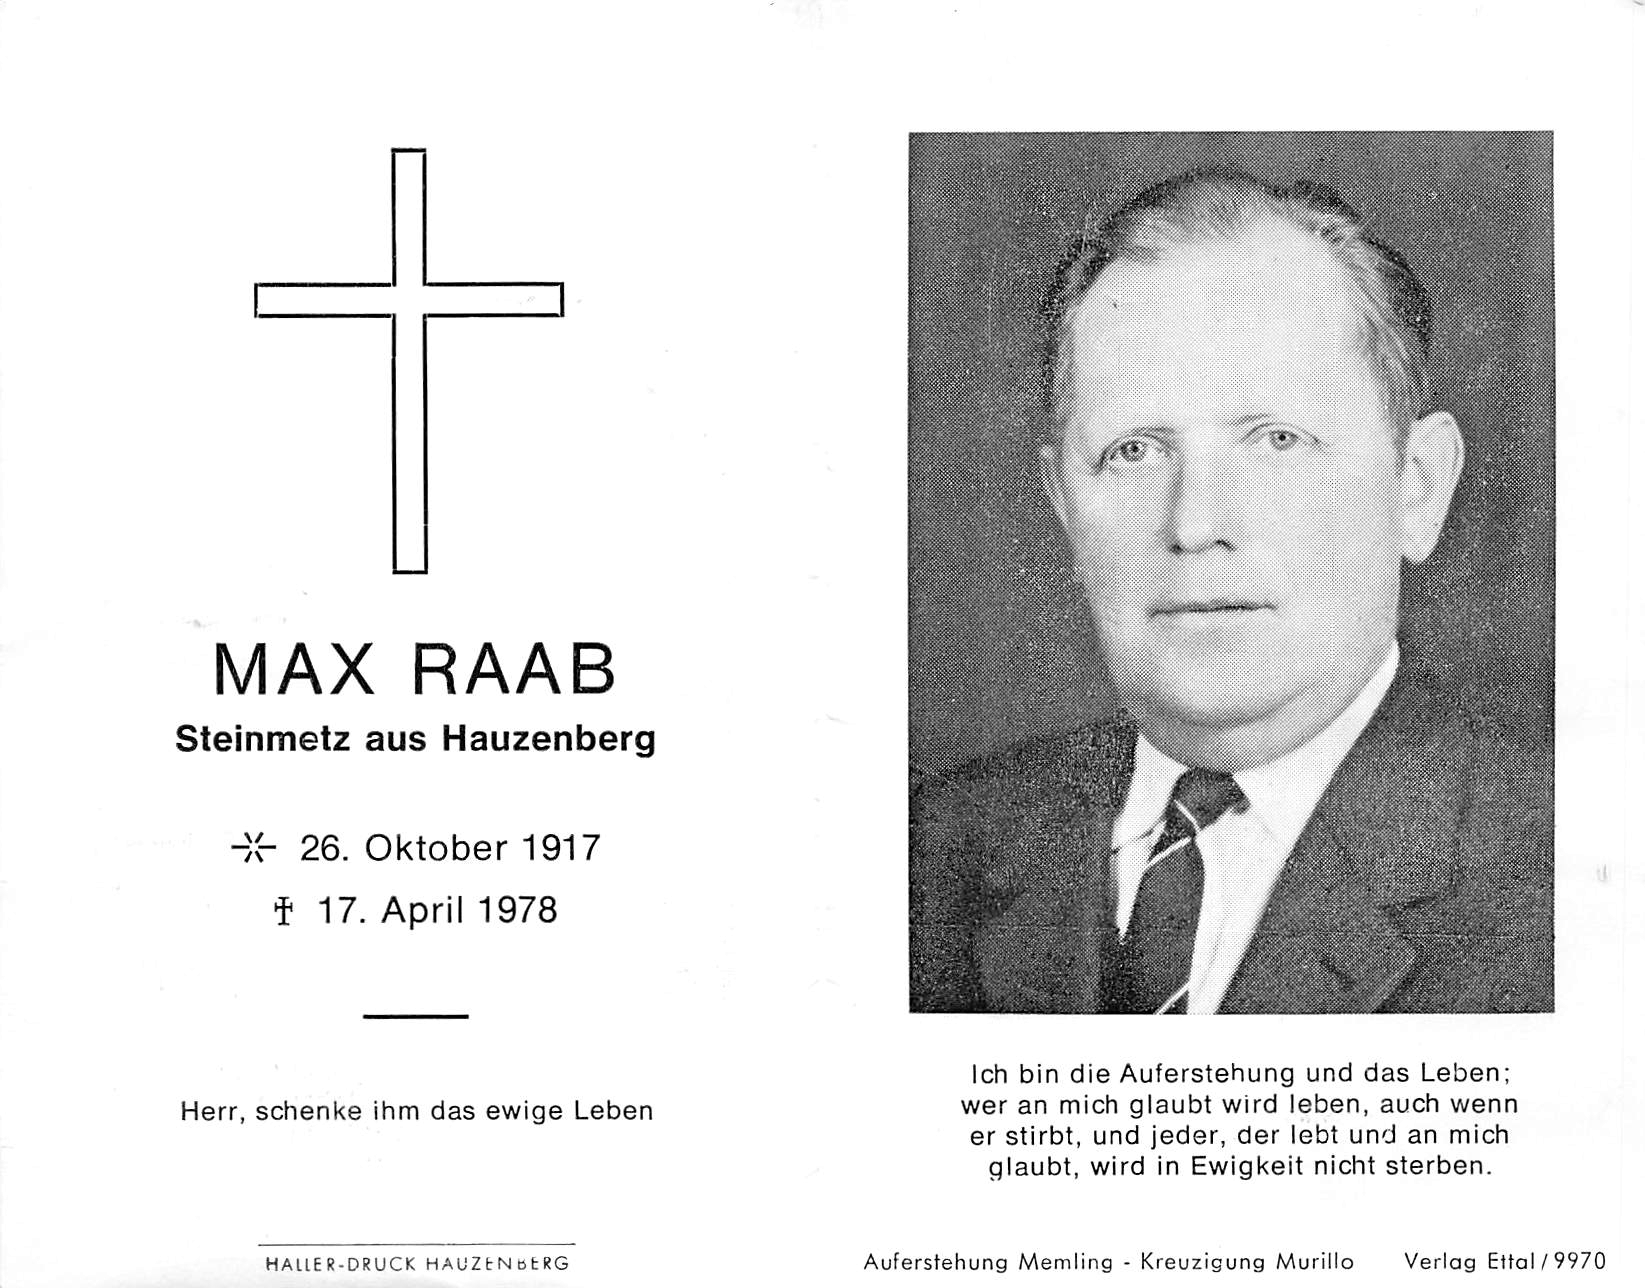 1978-04-17-Raab-Max-Hauzenberg-Steinmetz